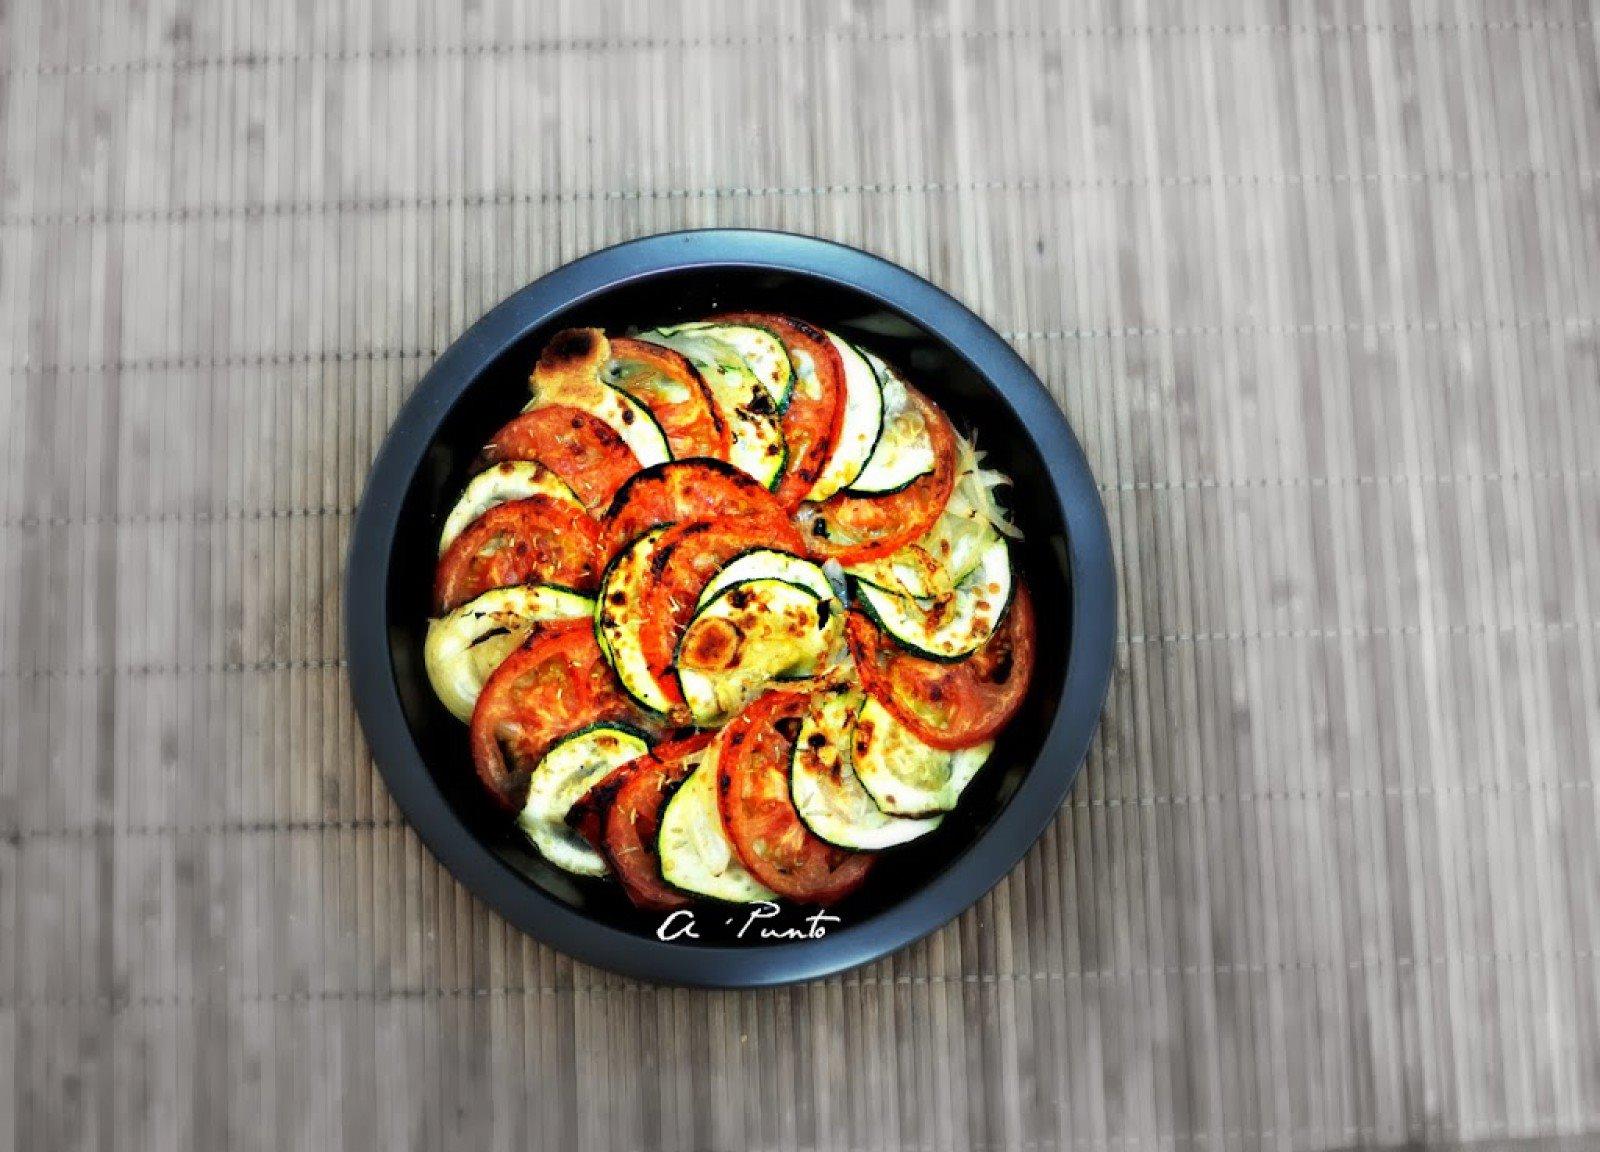 Verduras-gratinadas-1600x1152_1